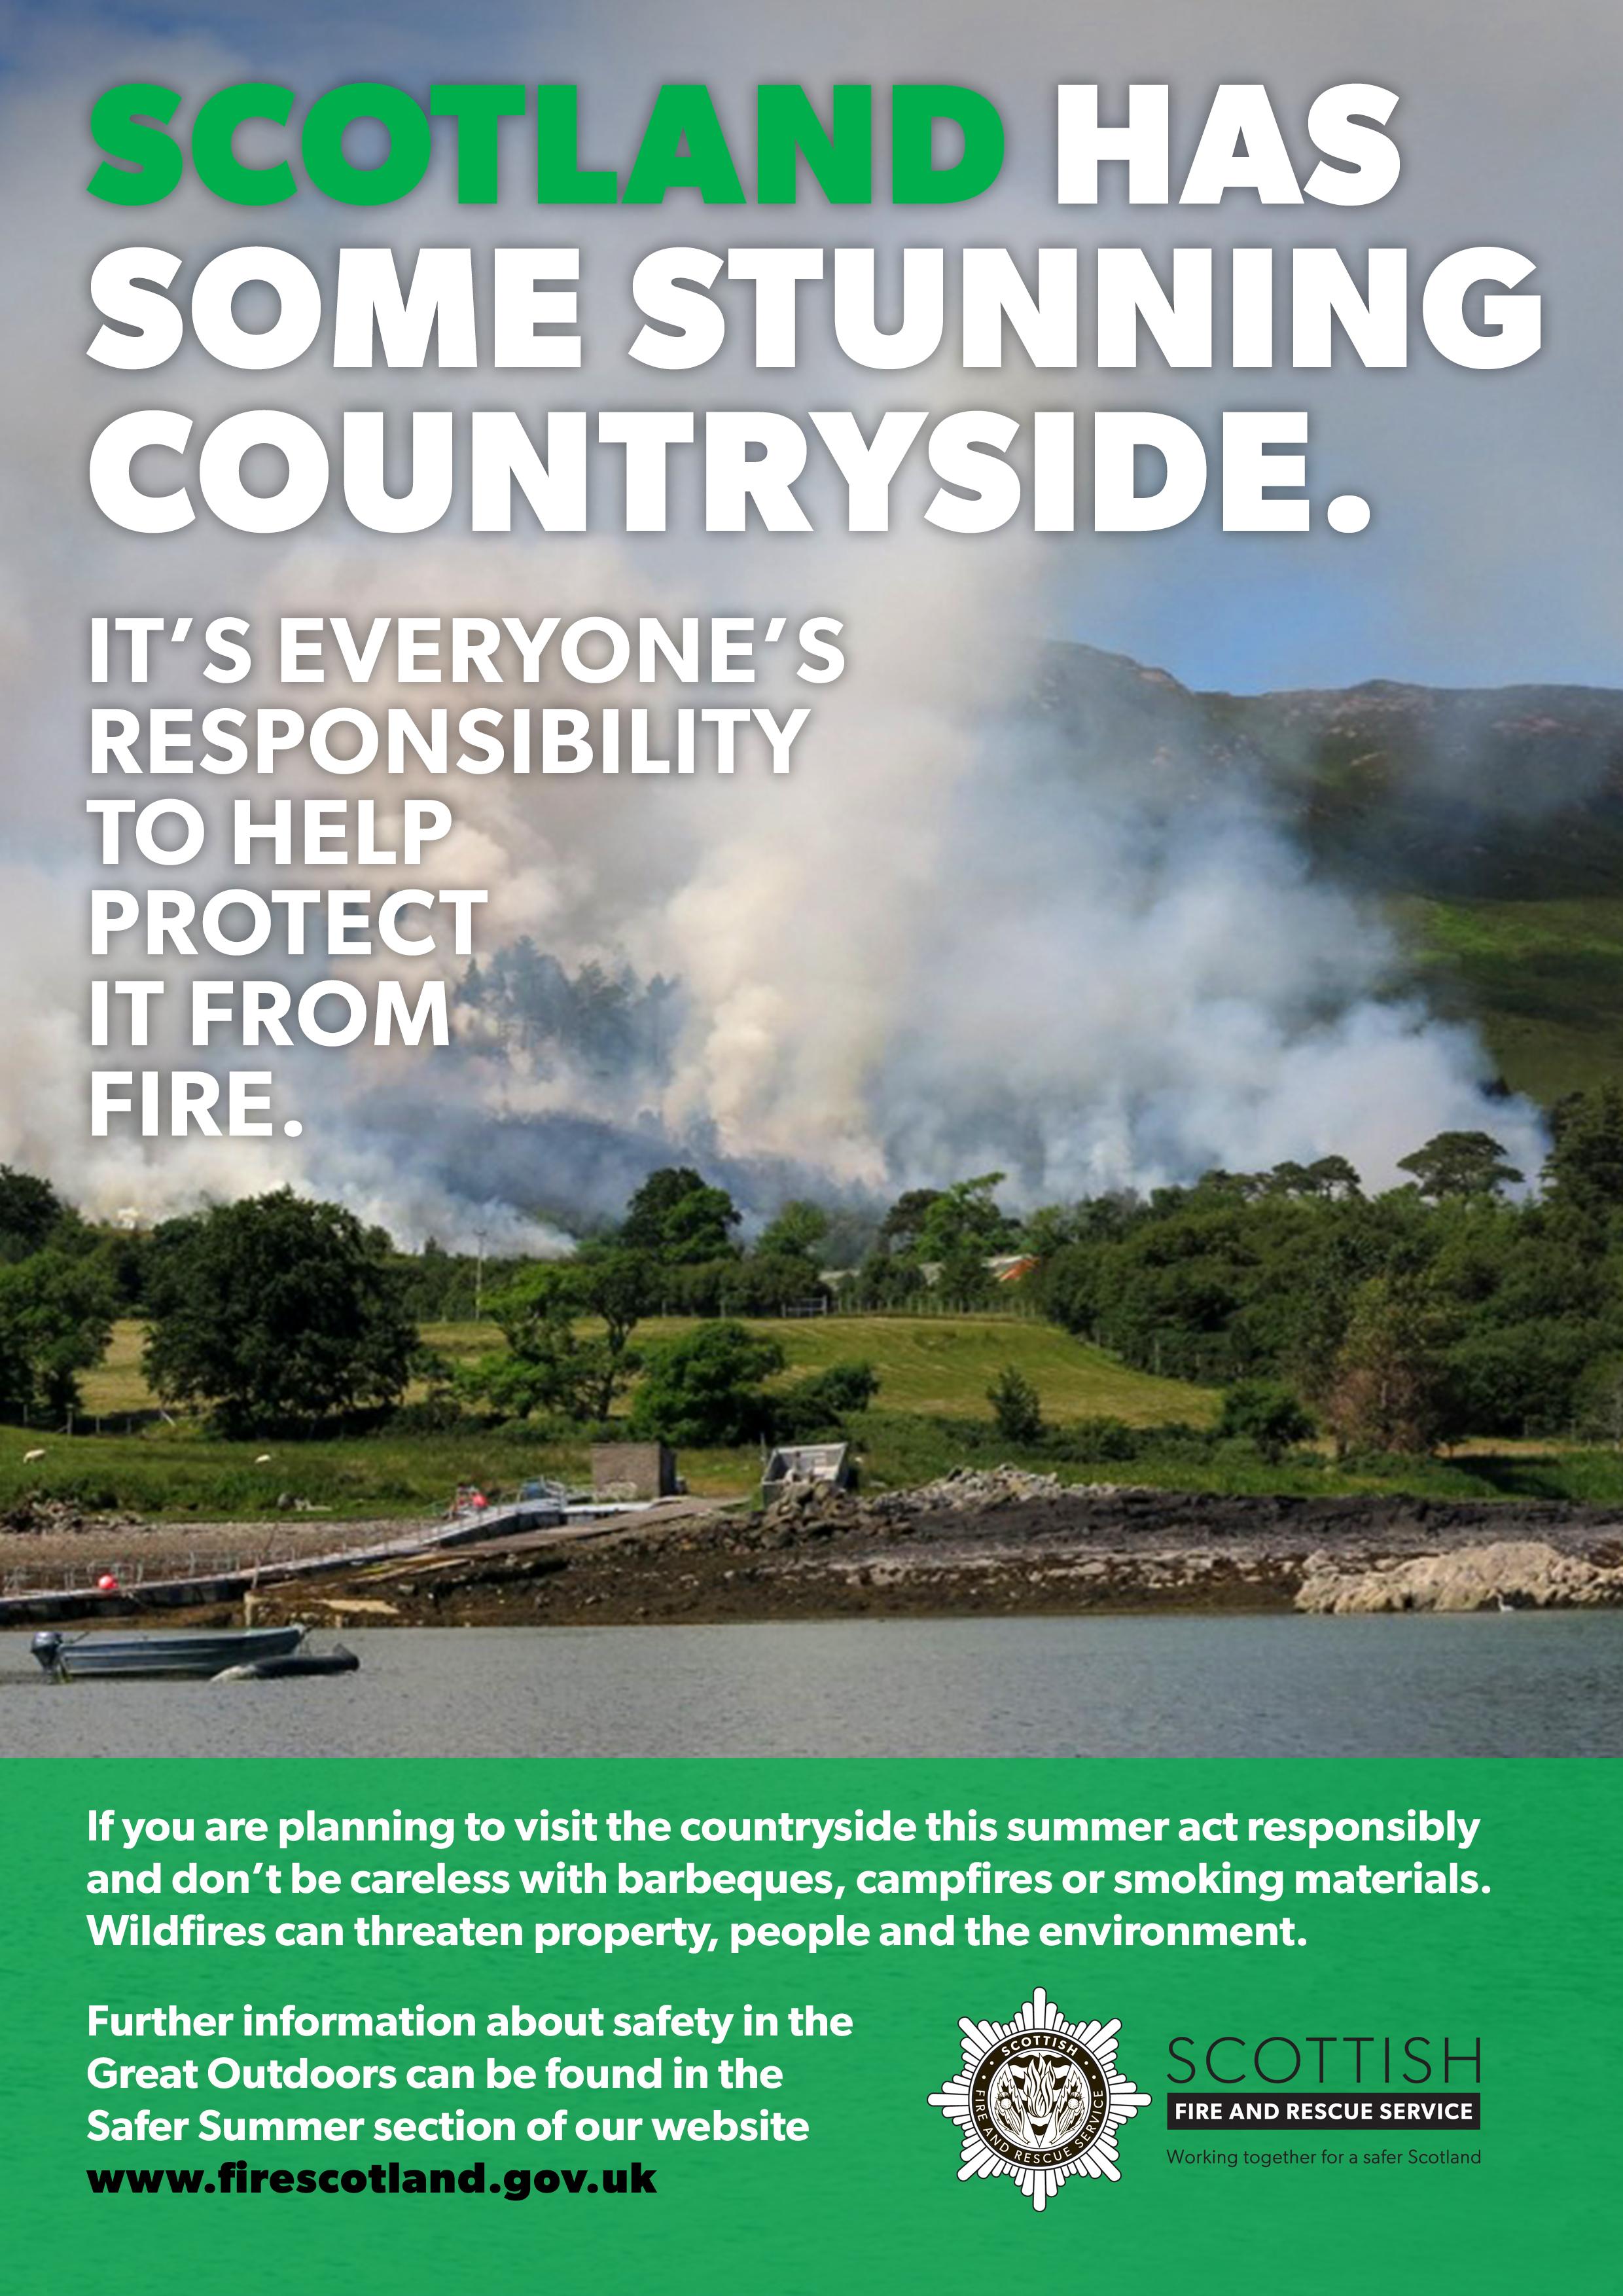 Crews tackling gorse fire at Daviot Wood, near Inverness